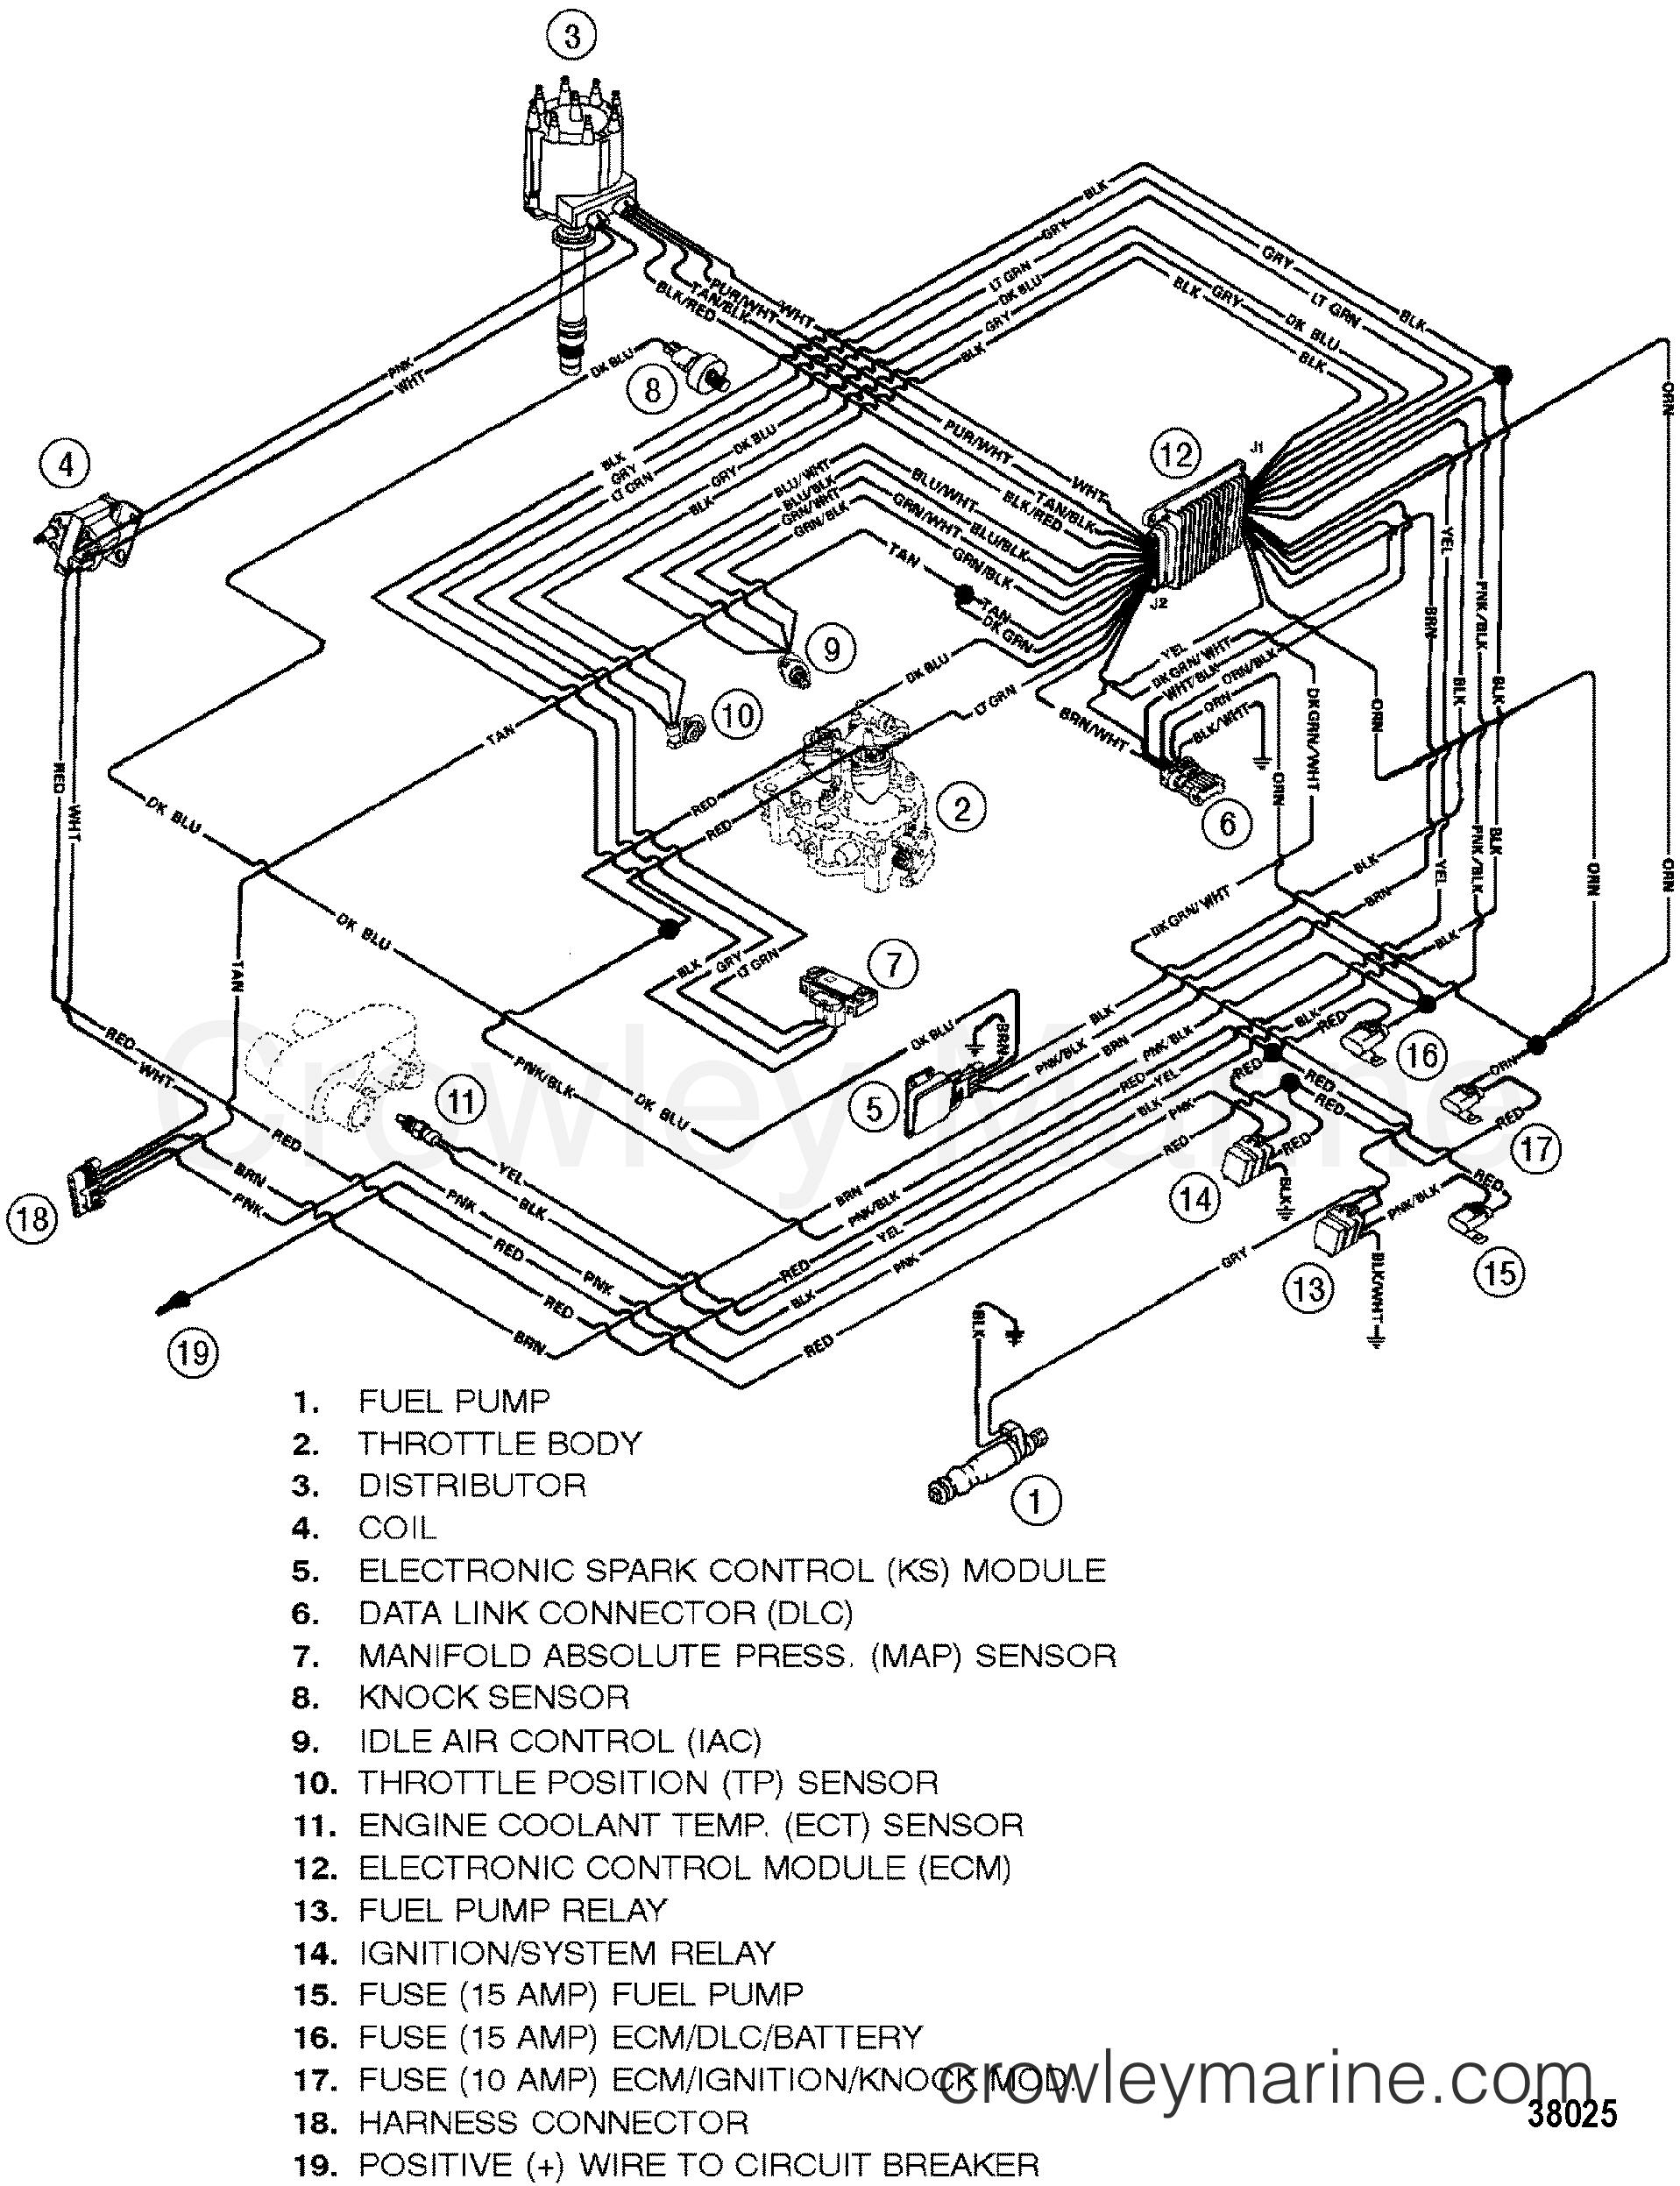 wiring harness efi 1996 mercruiser 7 4lxtbi bravo 474l111js rh crowleymarine com Mercury Tachometer Wiring Harness Universal Wiring Harness